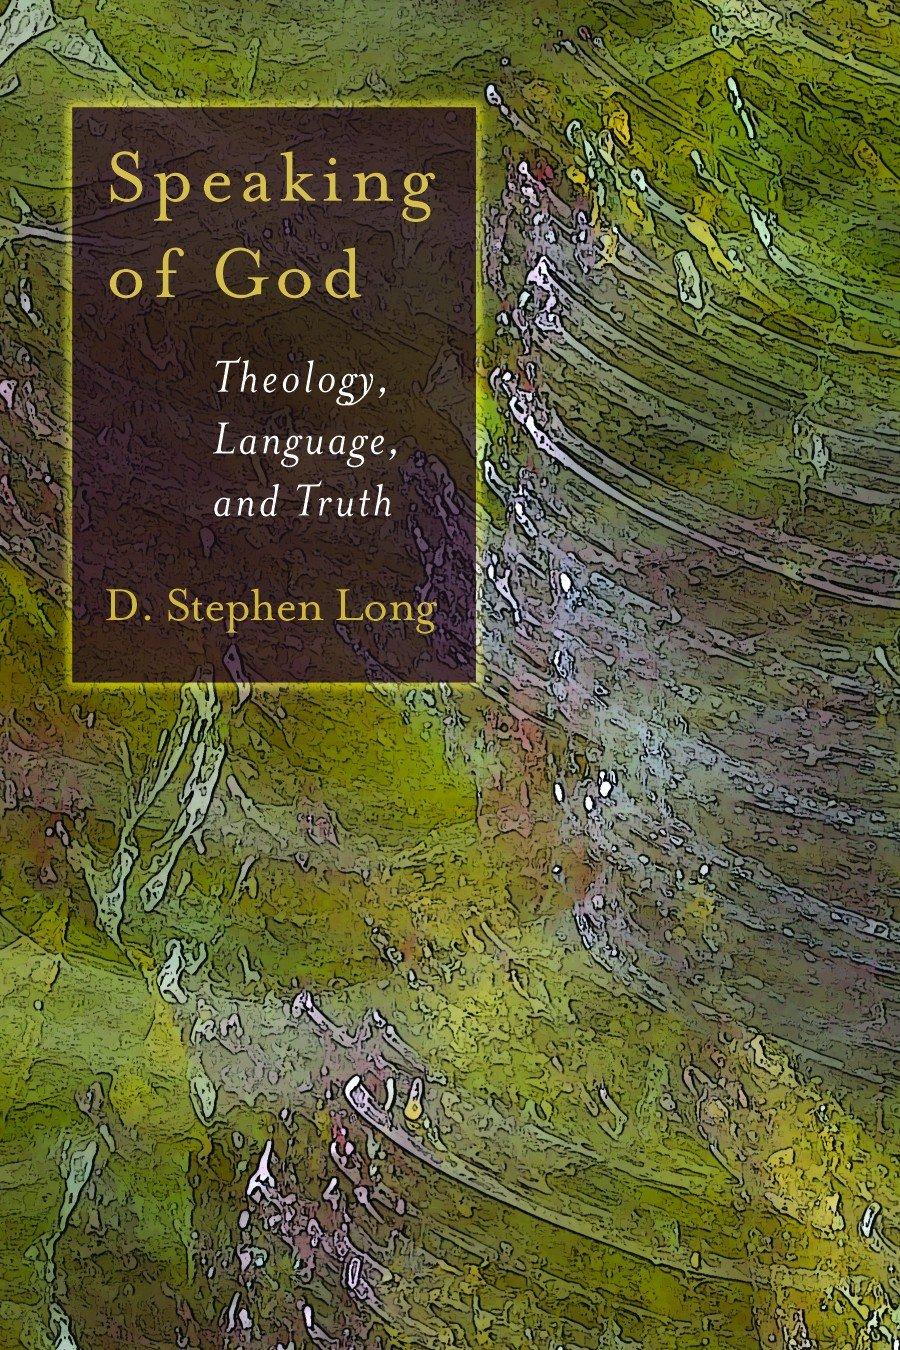 Speaking of God: Theology, Language and Truth (Eerdmans Ekklesia Series)